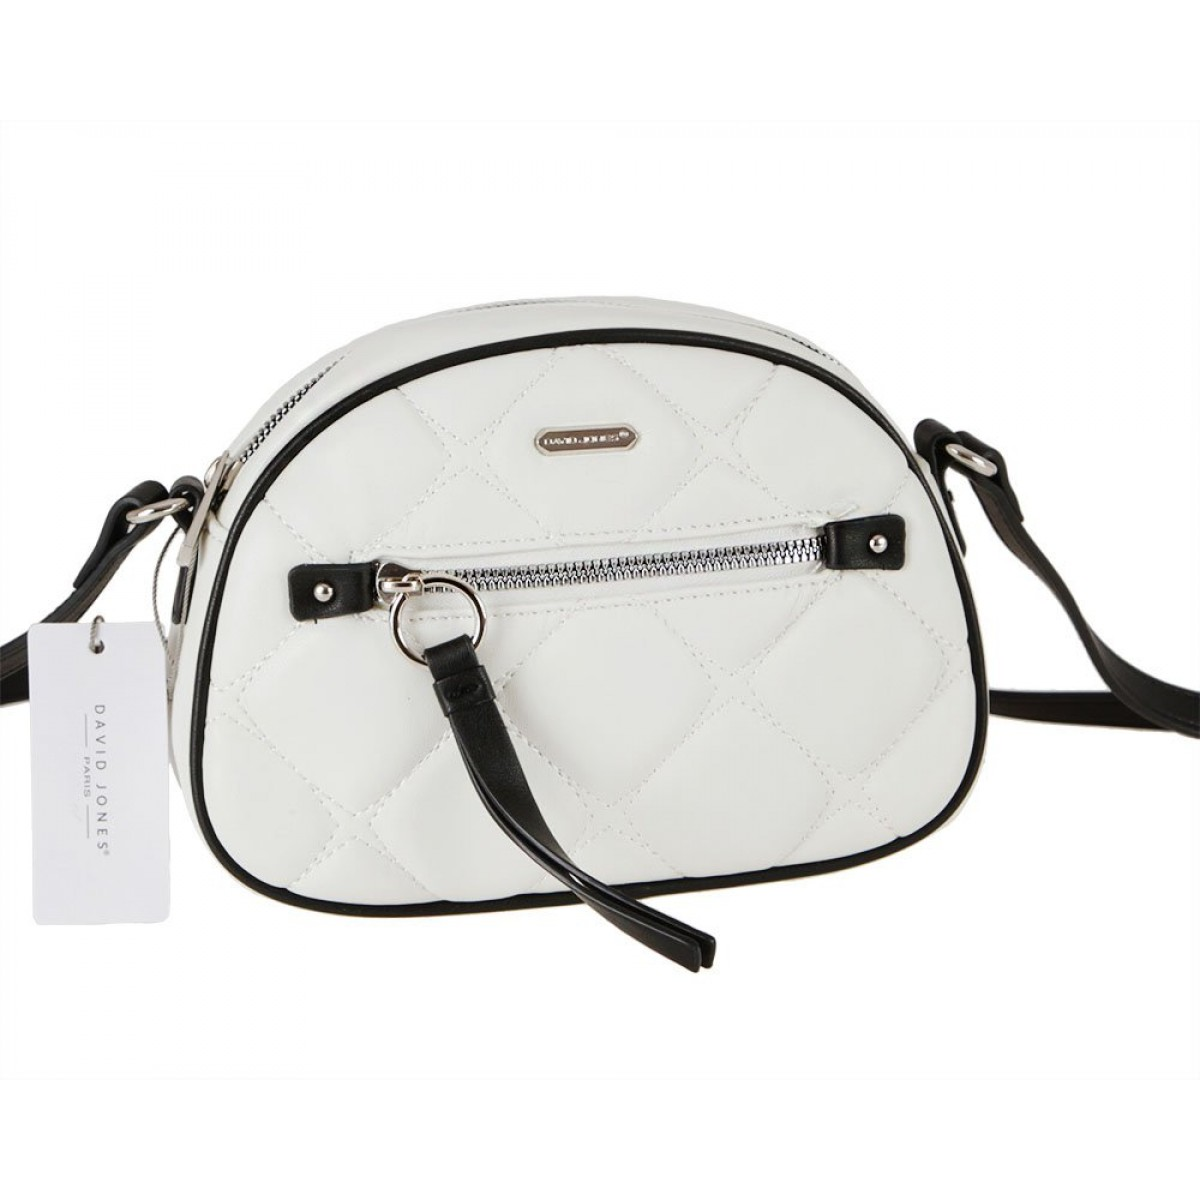 Жіноча сумка David Jones 6520-1 CREAMY WHITE